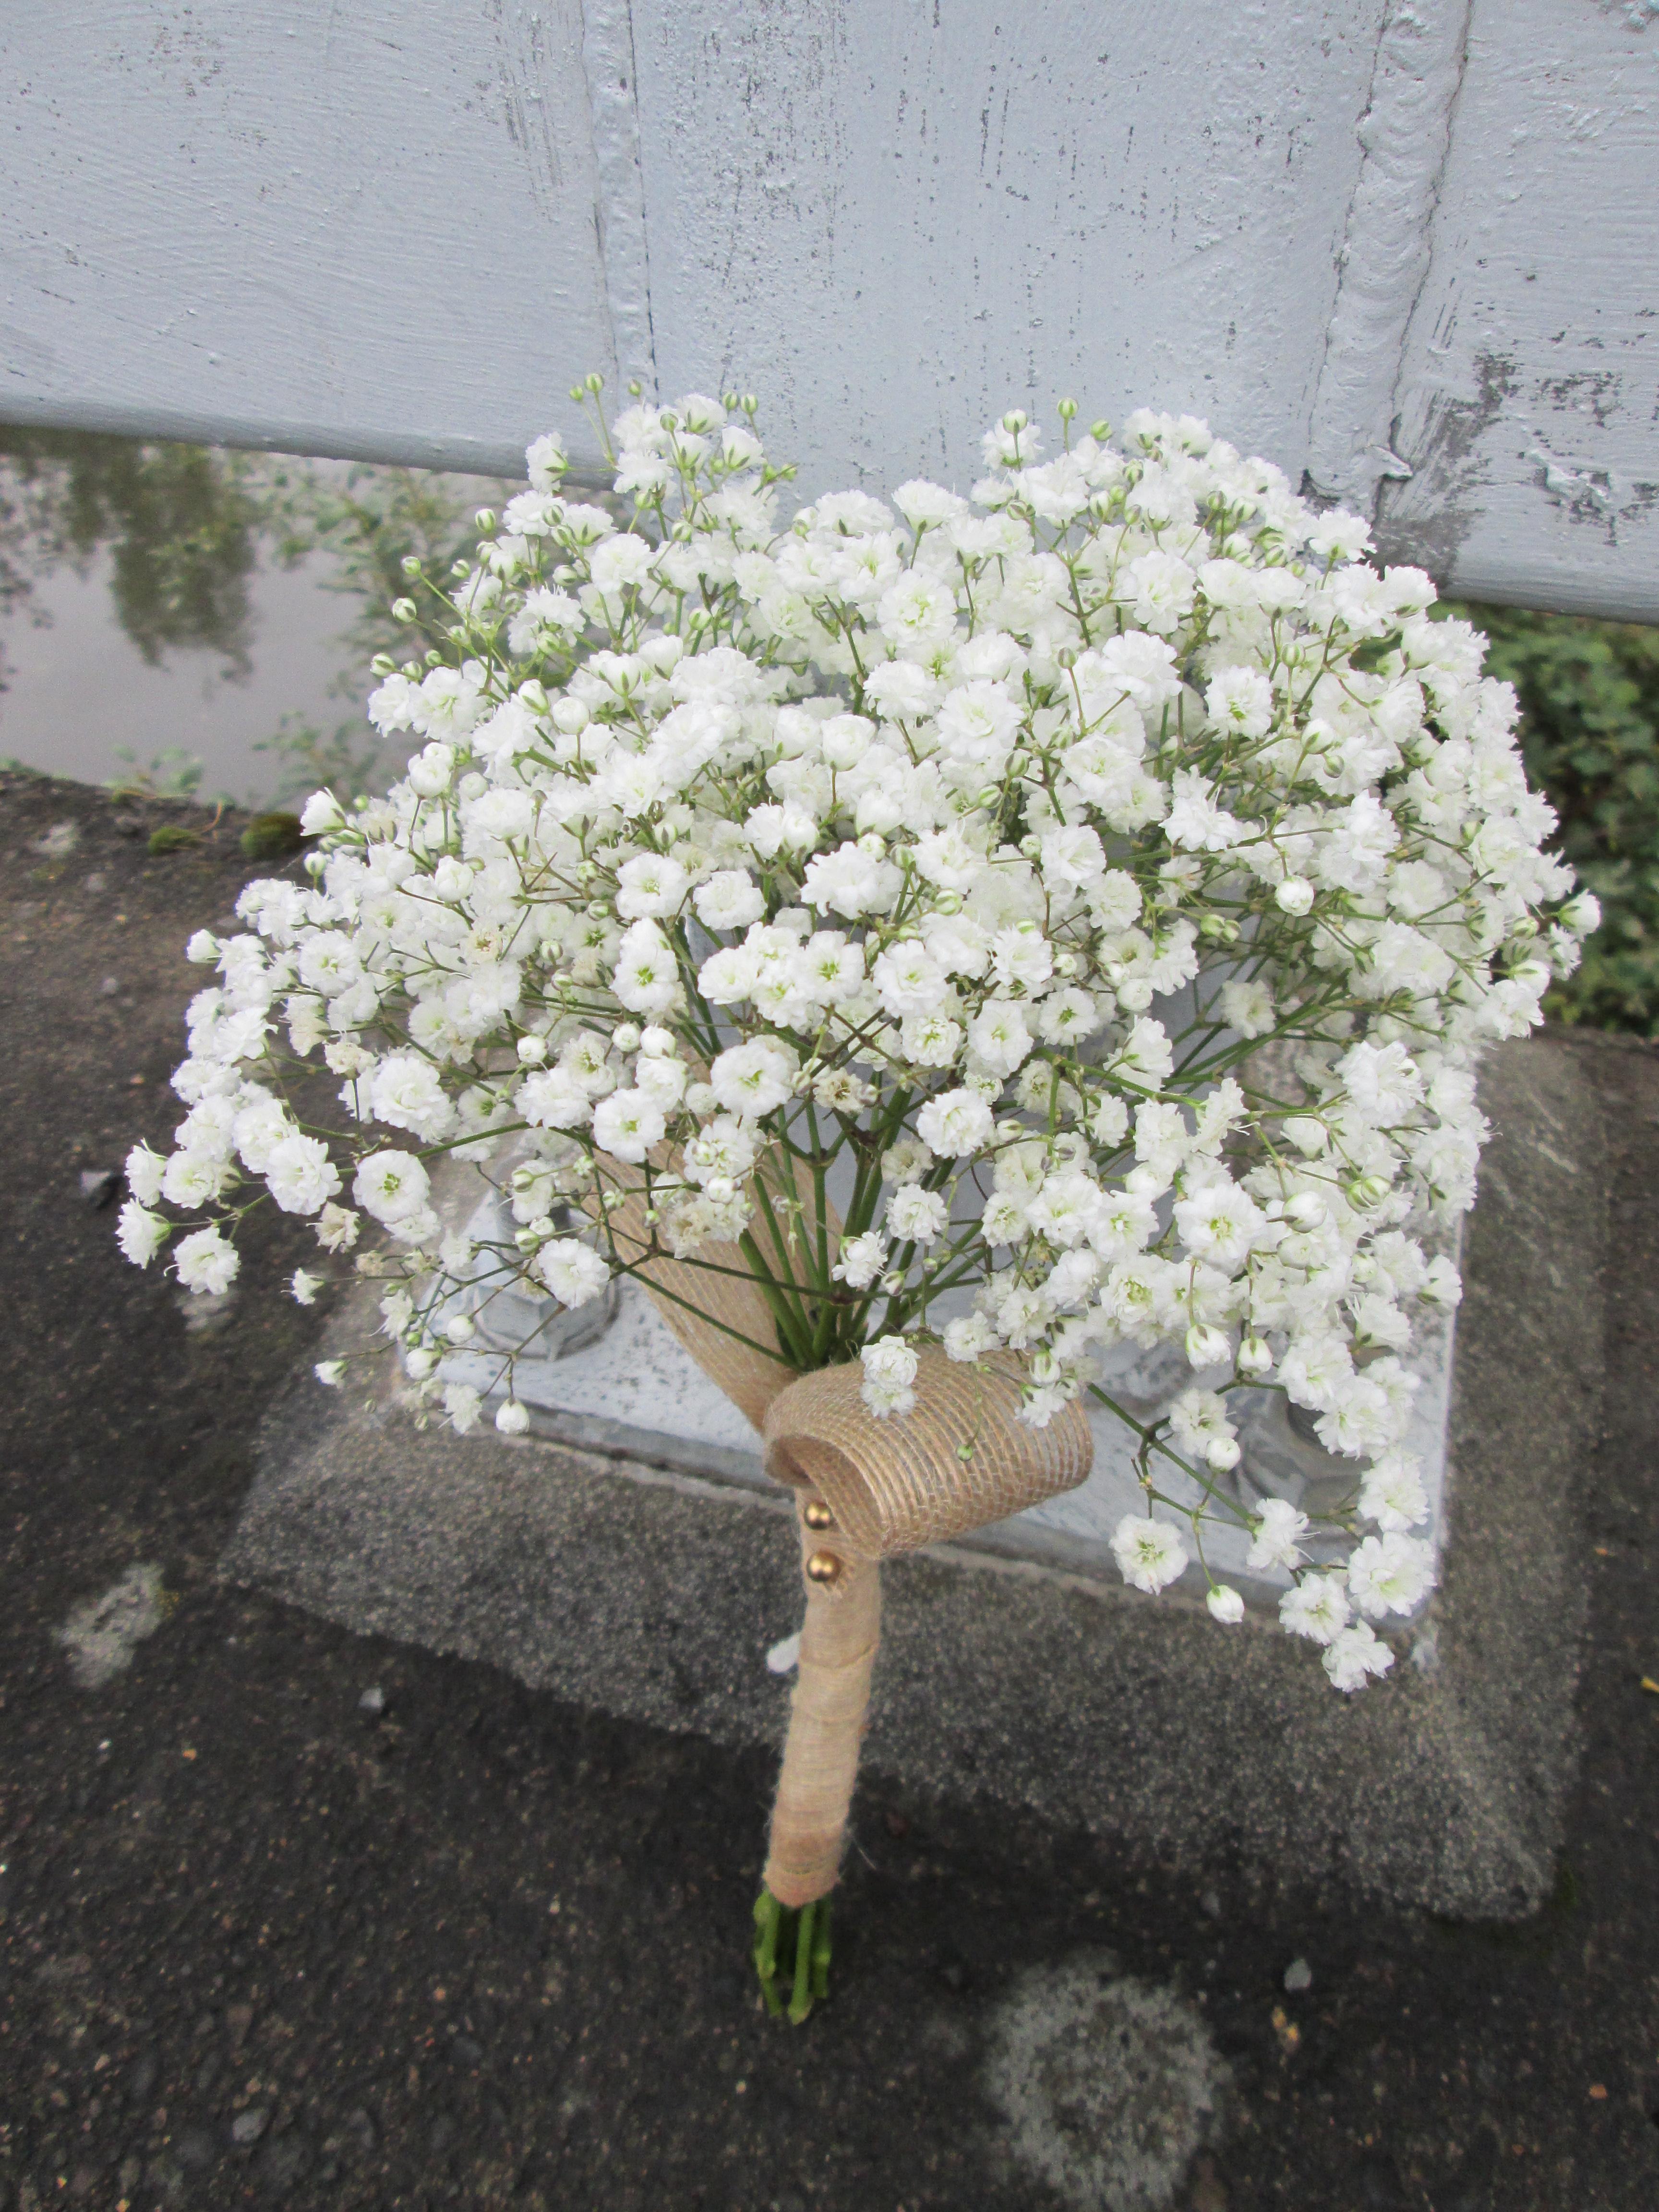 Burlap Wedding Ideas Dandelions Flowers Amp Gifts